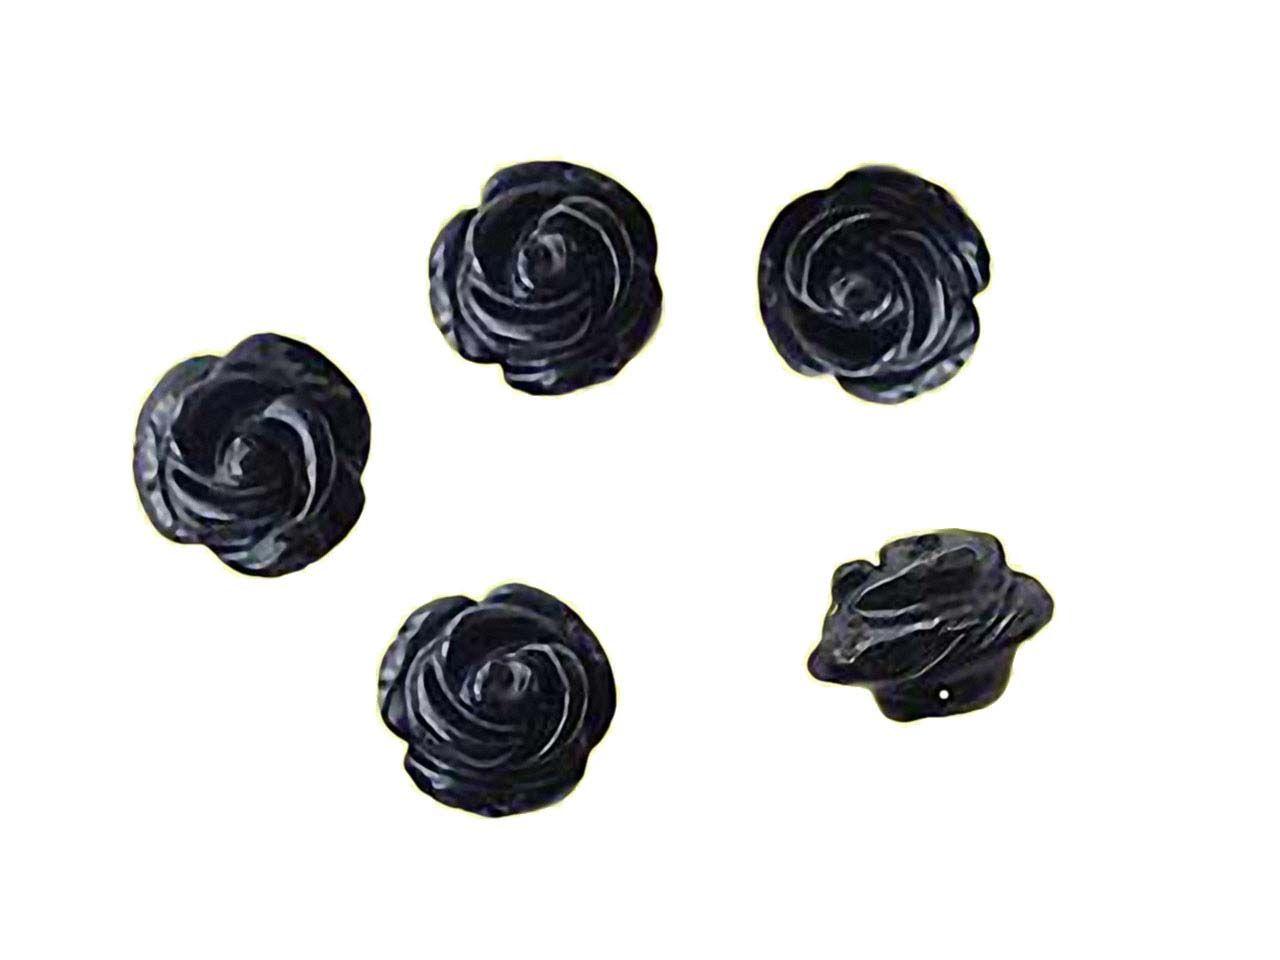 perlen schwarze achat rosen 12mm. Black Bedroom Furniture Sets. Home Design Ideas